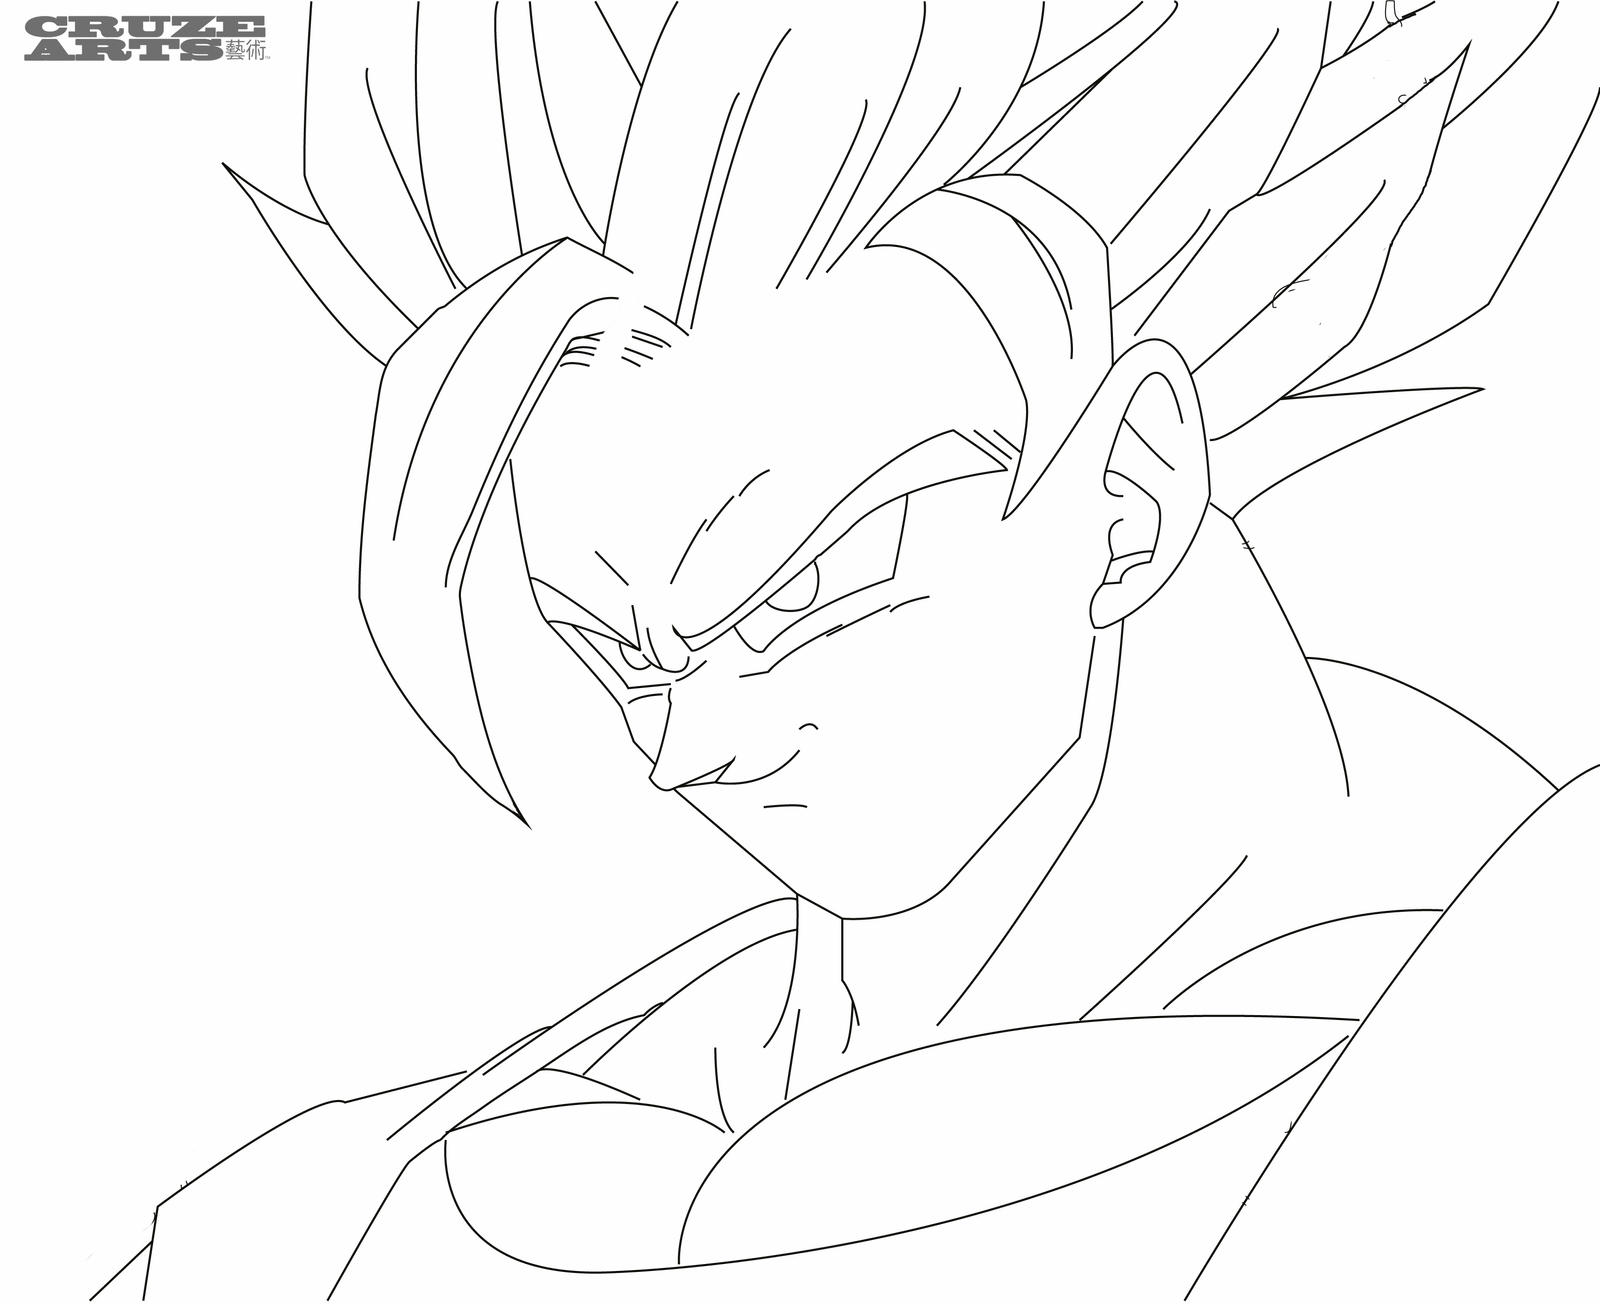 Sketches Of Goku Ssj1 Kamehameha Coloring Pages